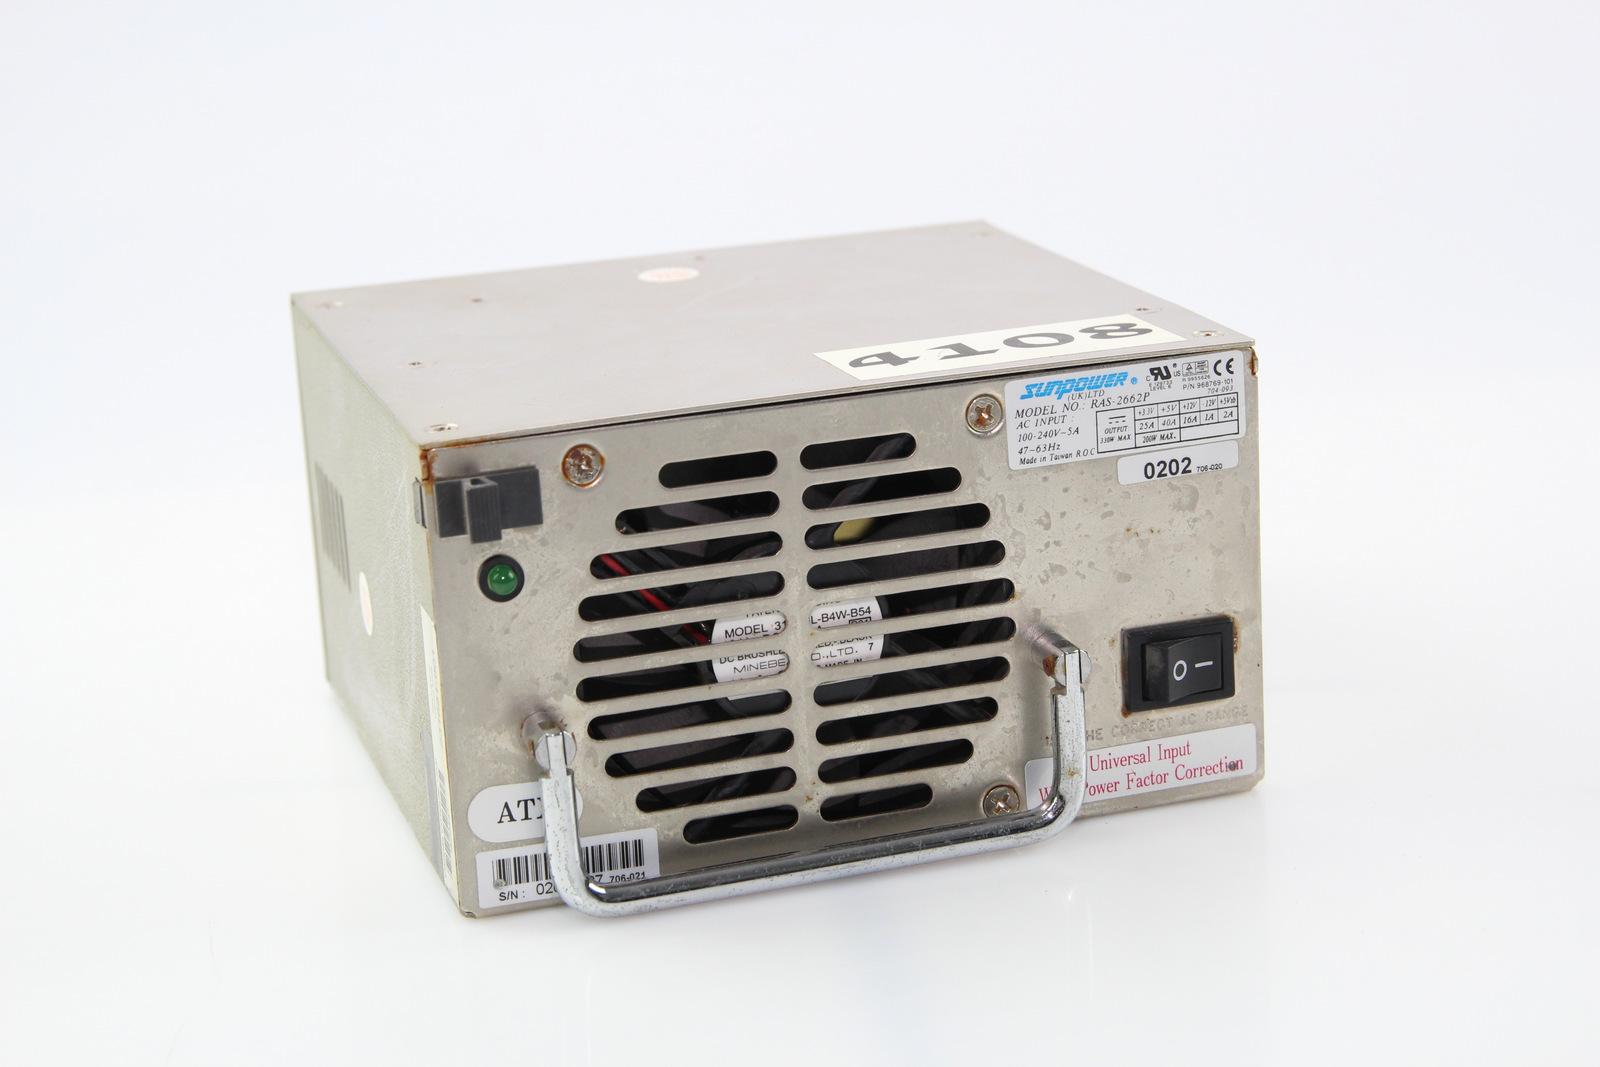 Surplus Electronic Test Equipment : Sunpower model no ras p power supply w ebay